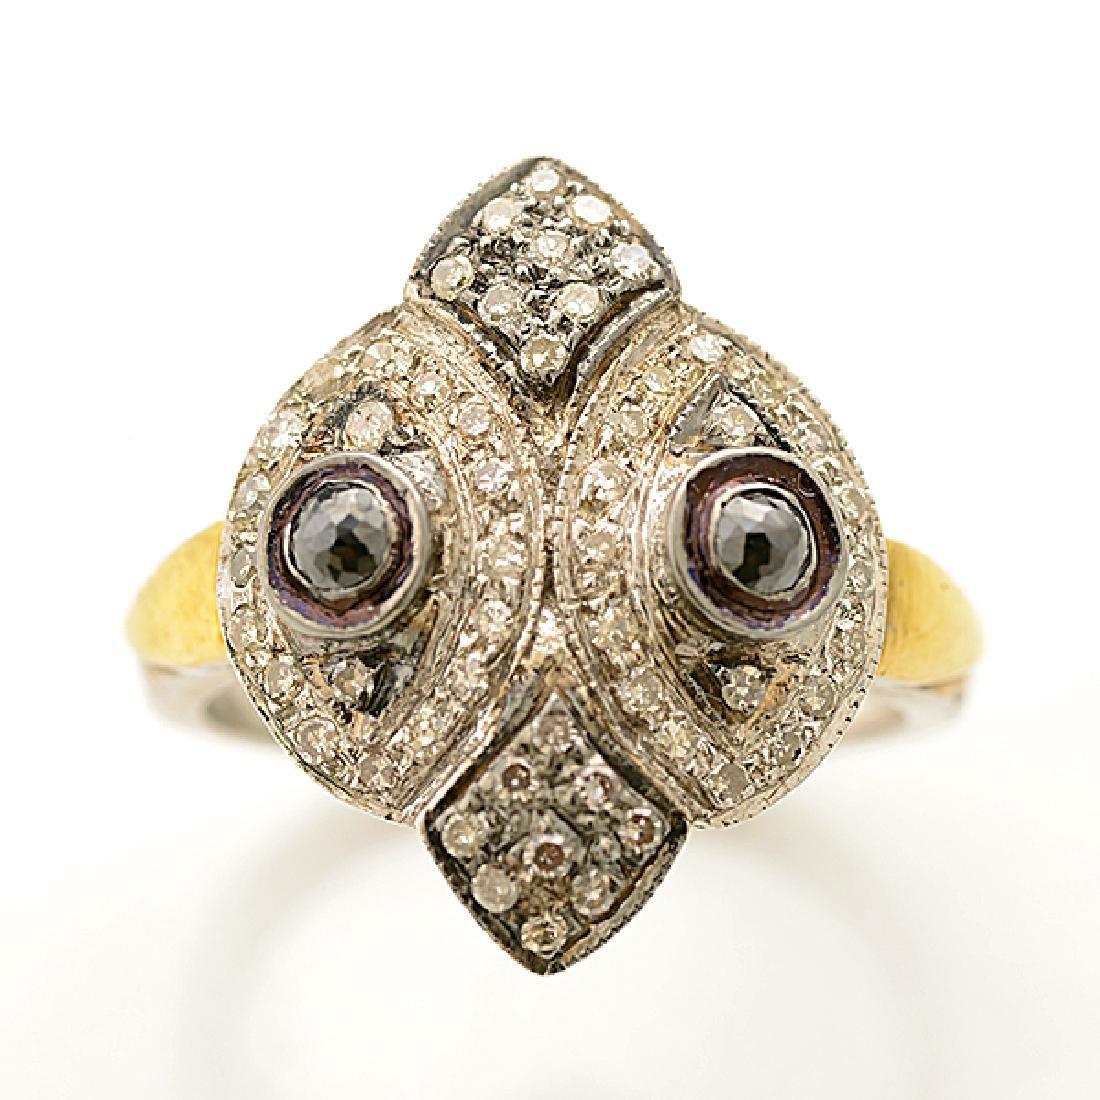 Diamond, Silver, 14k Yellow Gold Ring. - 2